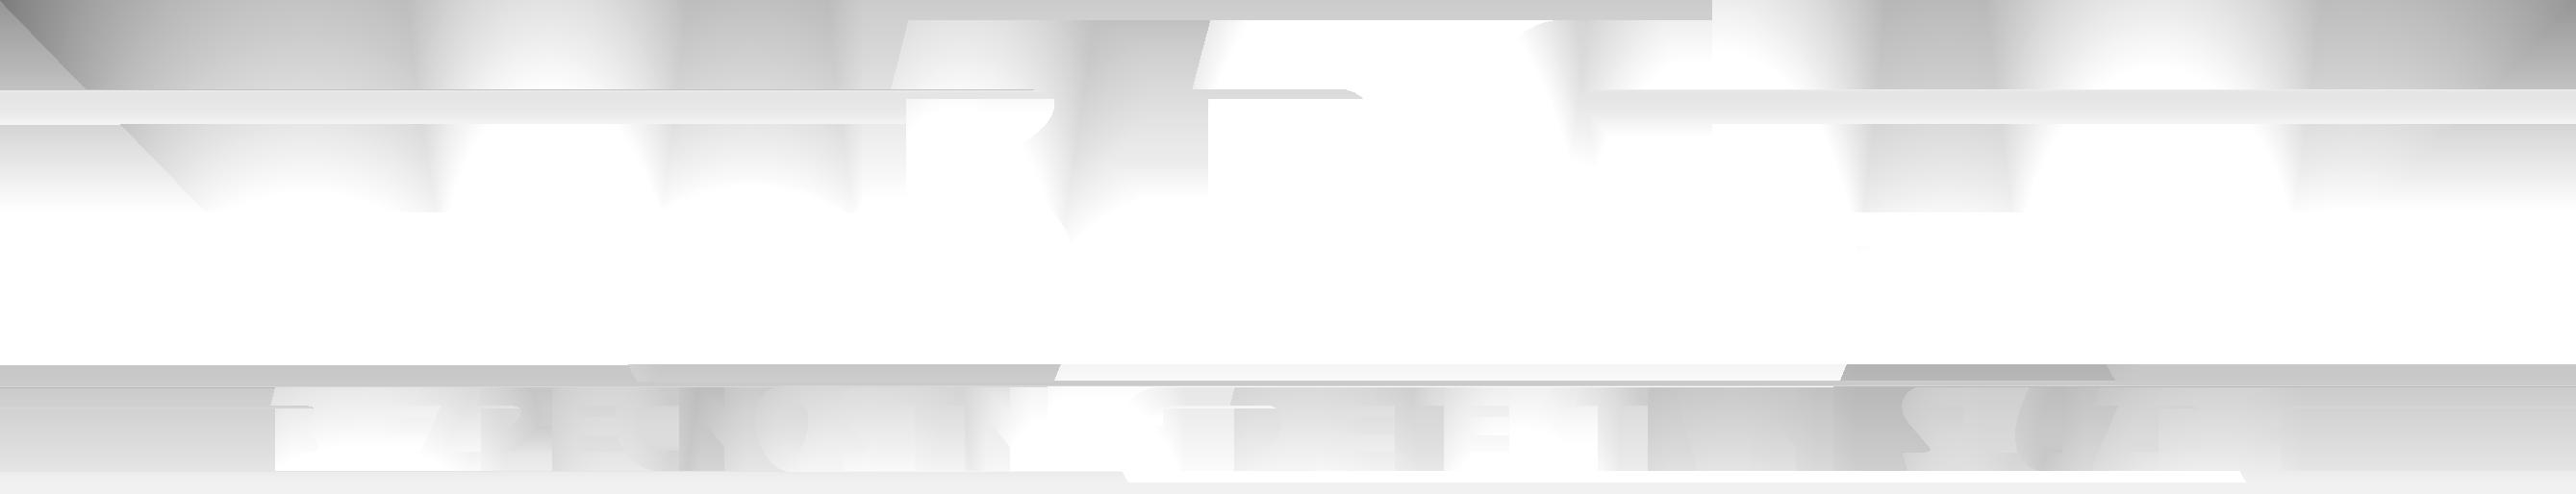 bezpečnostní agentura Defender Brokers